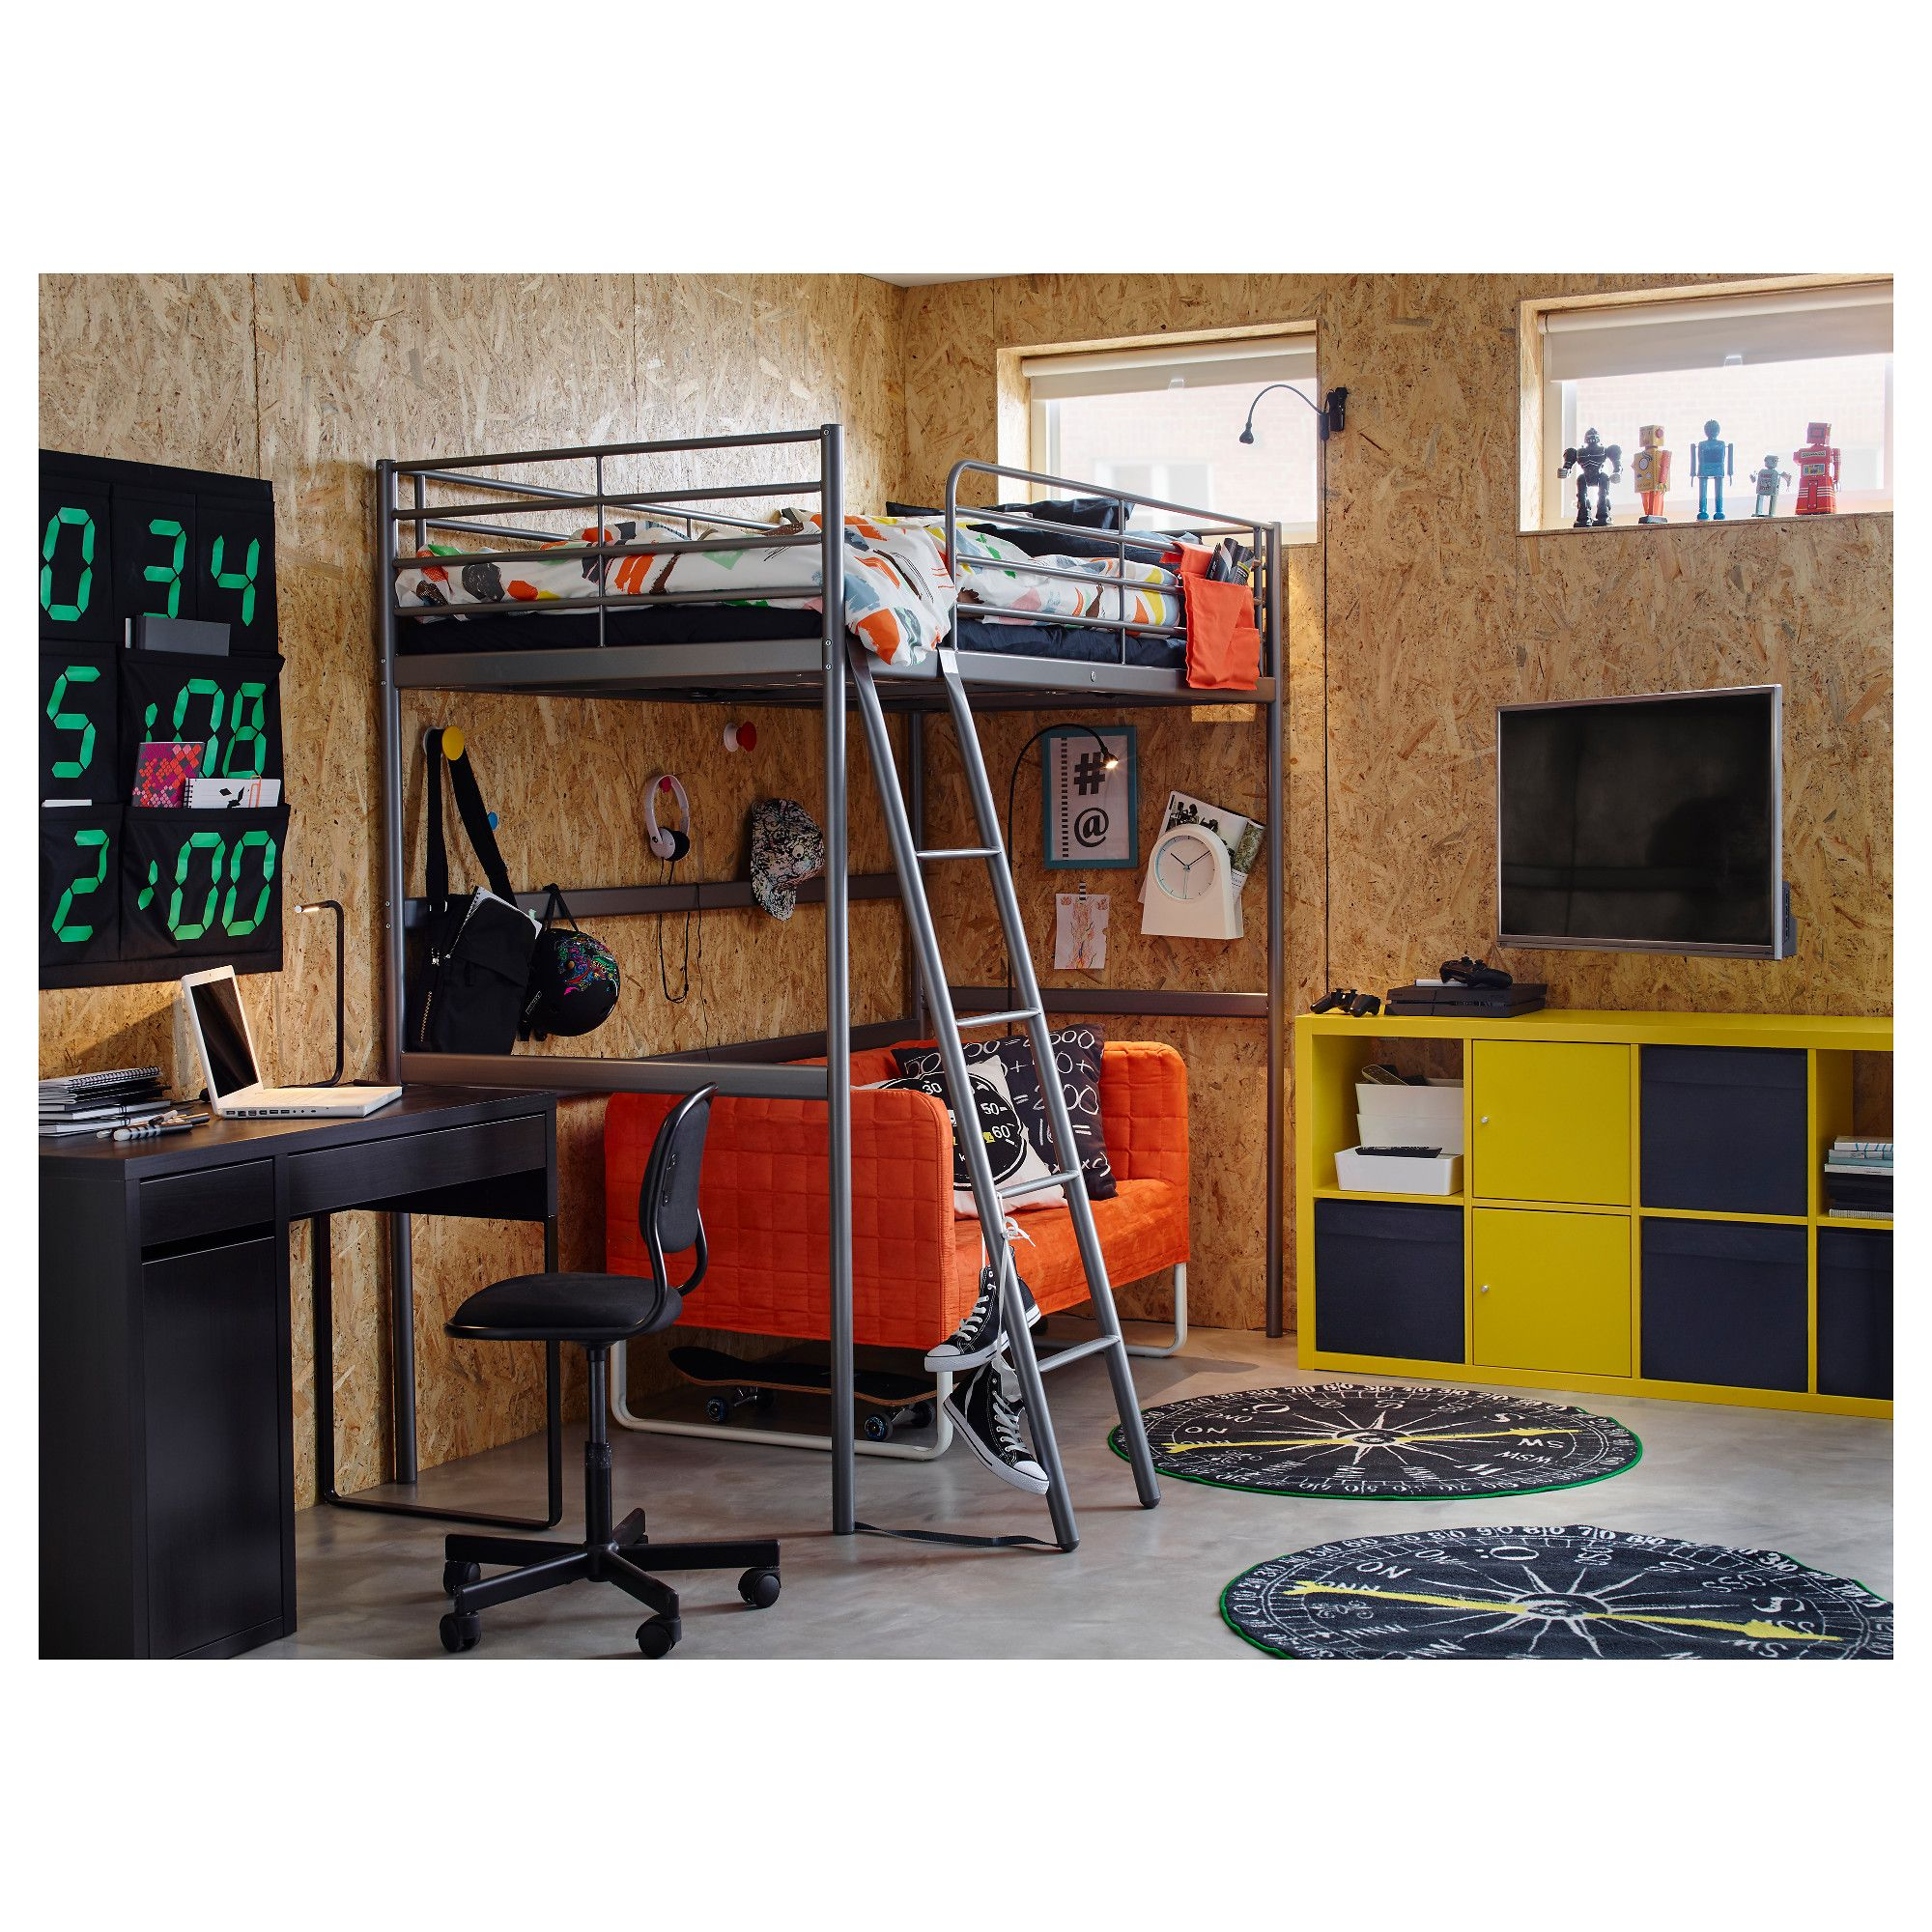 Tuffing loft bed ideas  IKEA  SVÄRTA Loft bed frame silver color  Interior Decor Thoughts